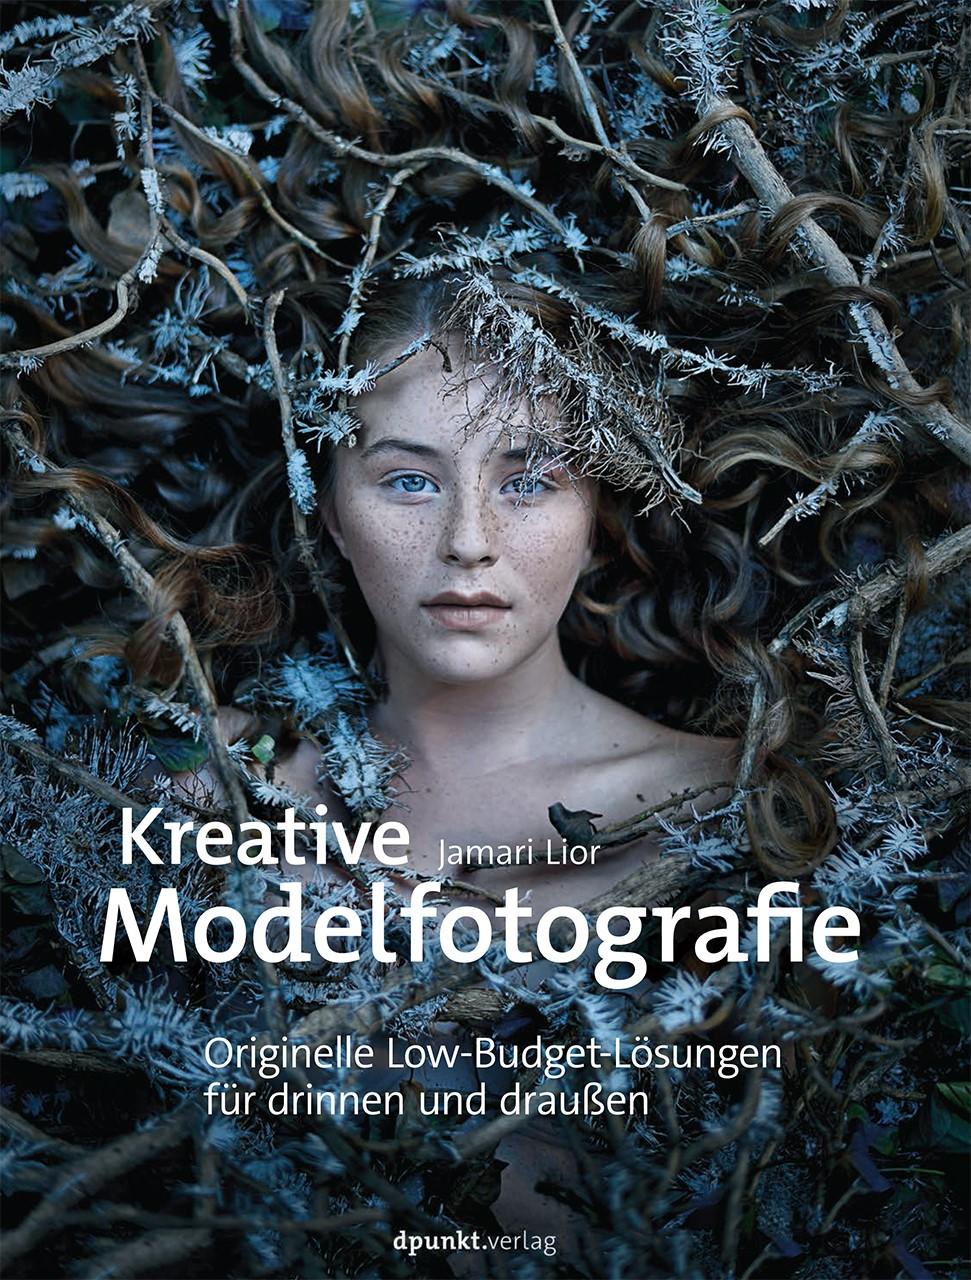 Kreative Modelfotografie | Lior, 2016 | Buch (Cover)